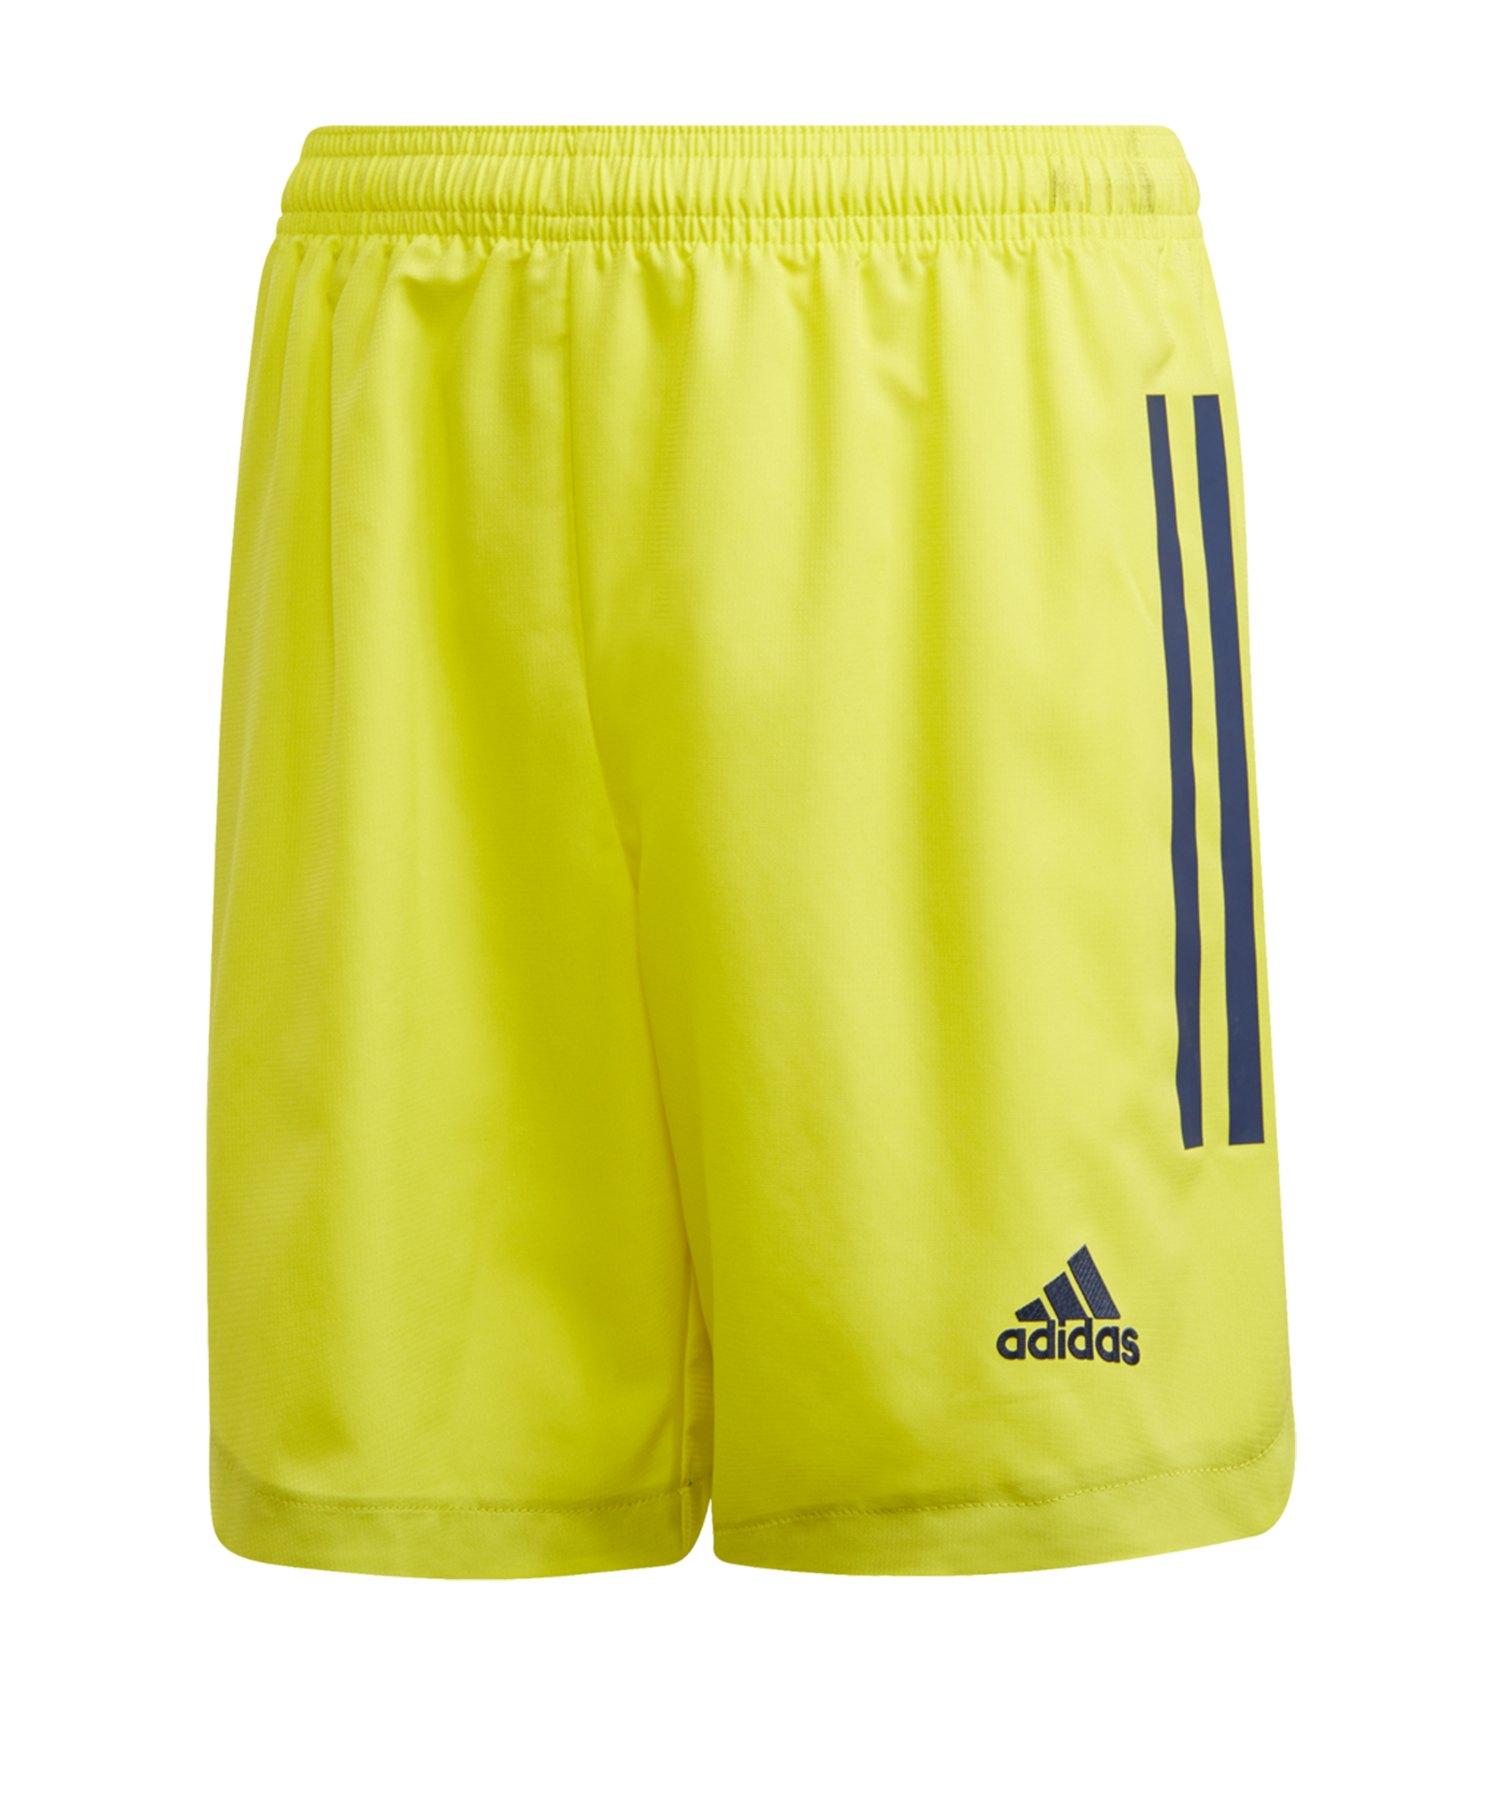 adidas Condivo 18 Short Hose kurz Kids Gelb gelb